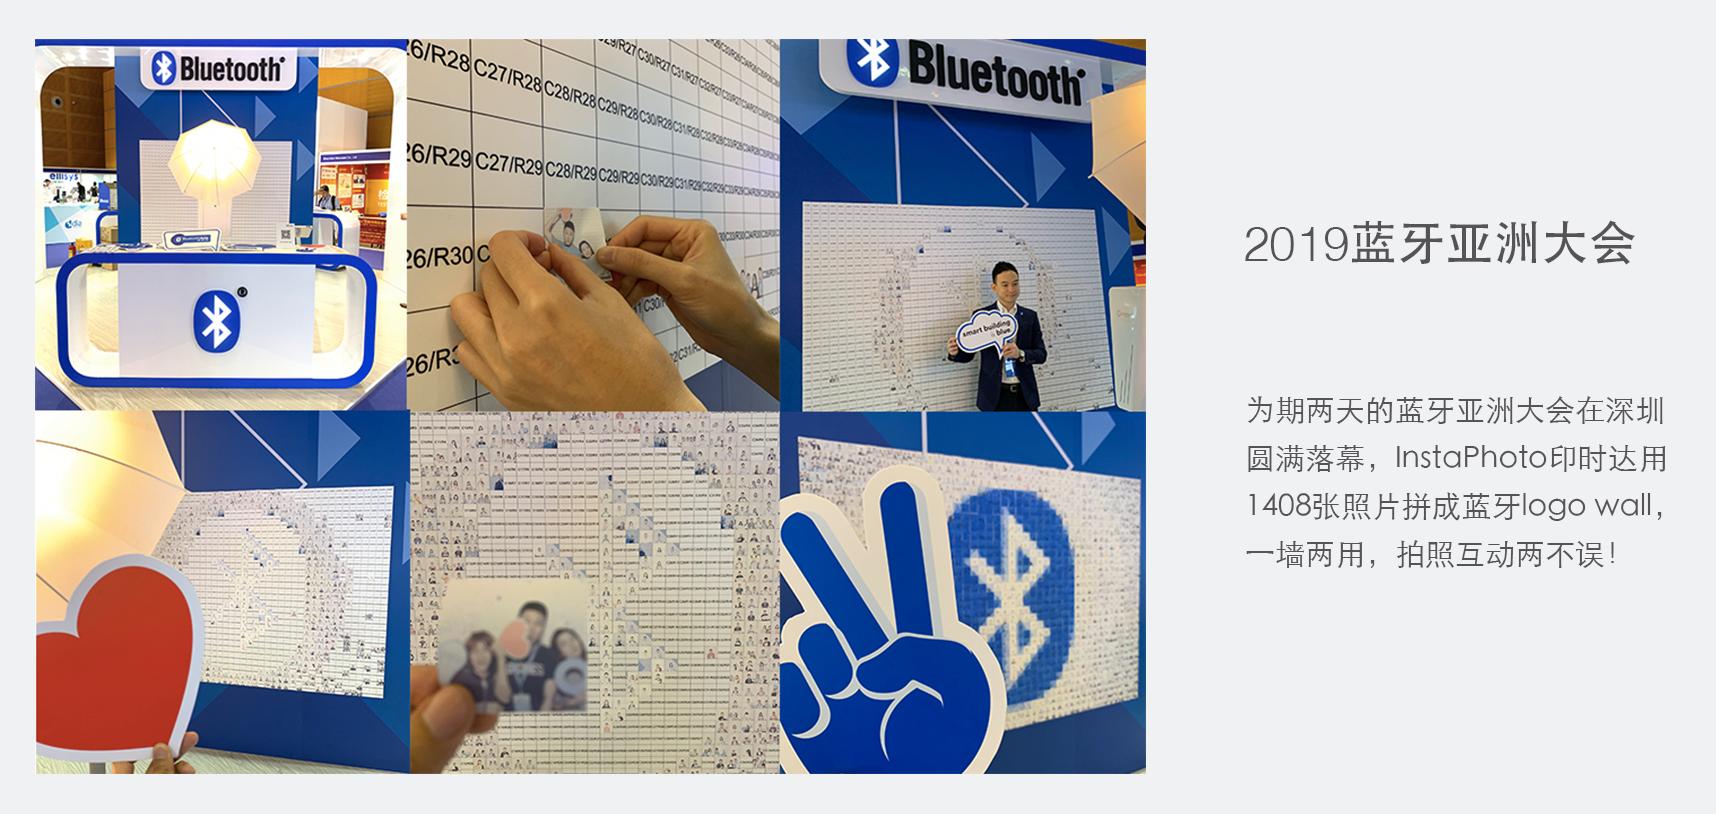 bluetooth0911 ch.png